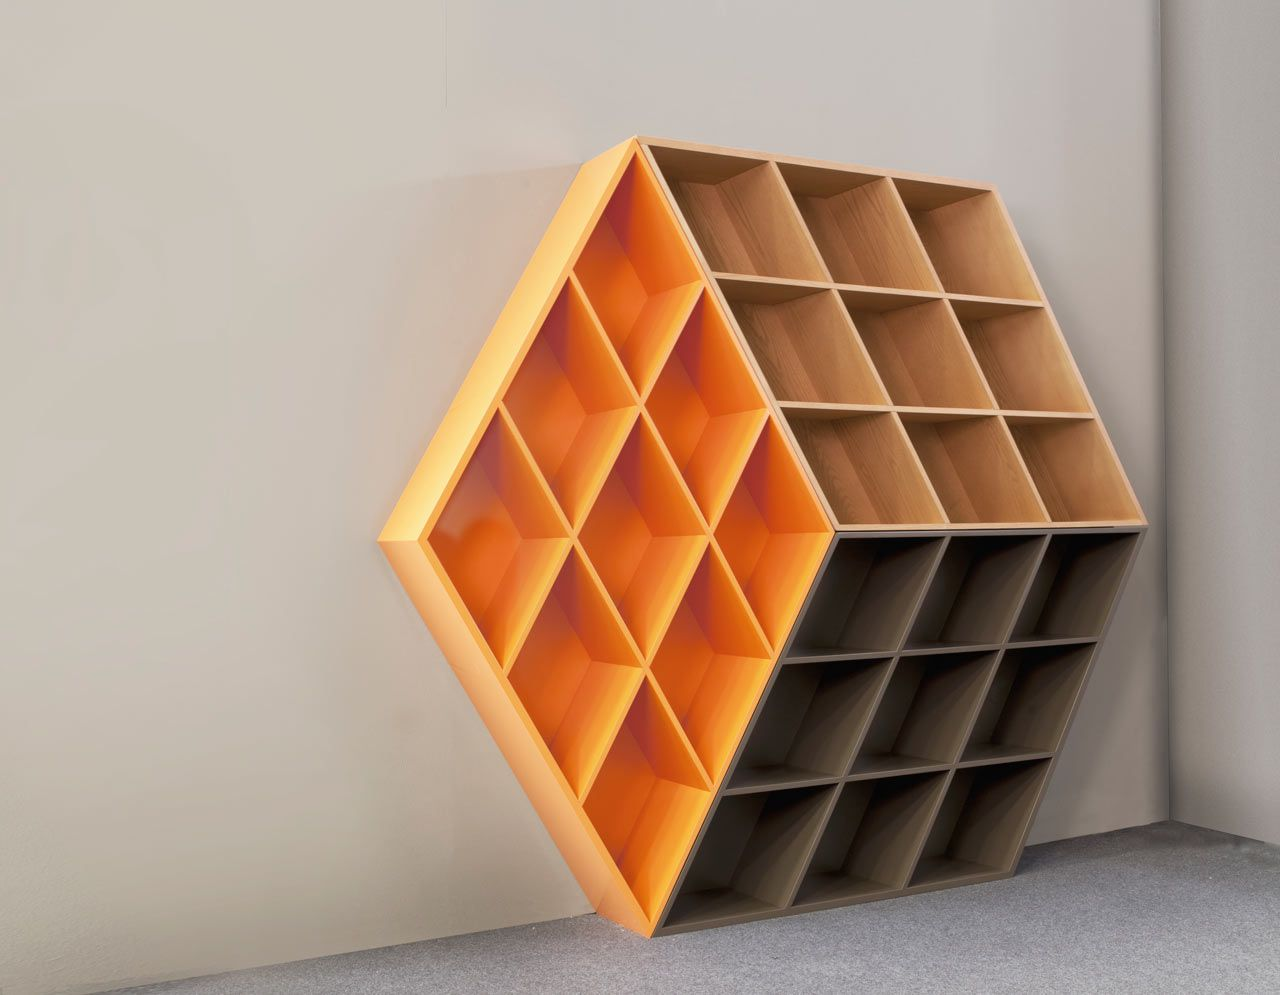 a wooden bookcase inspiredthe rubik's cube | cube design